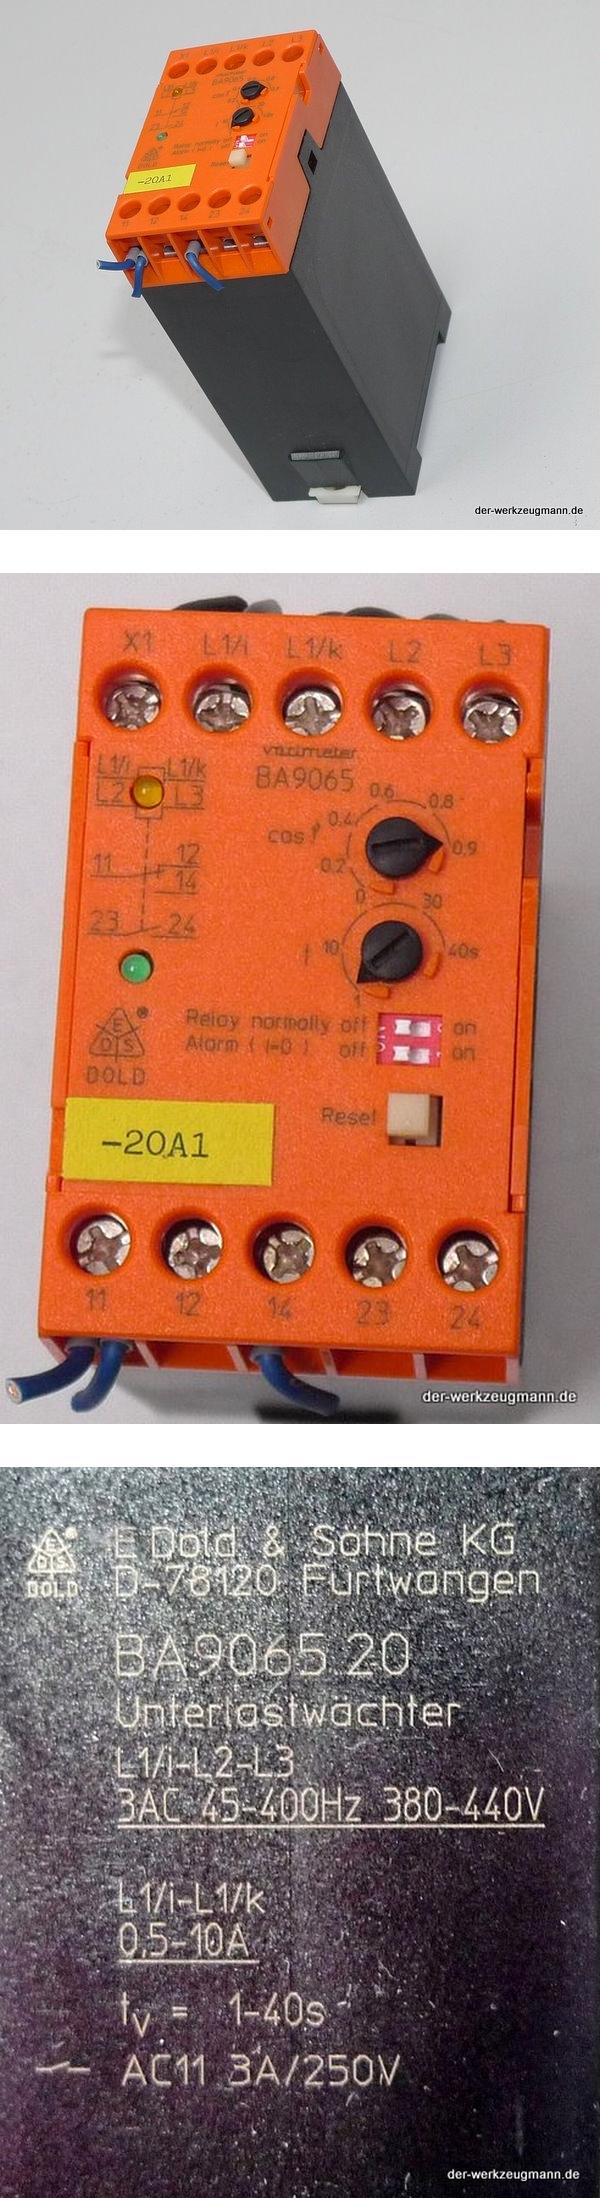 Dold varimeter BA9065.20 Unterlastwächter 0039727